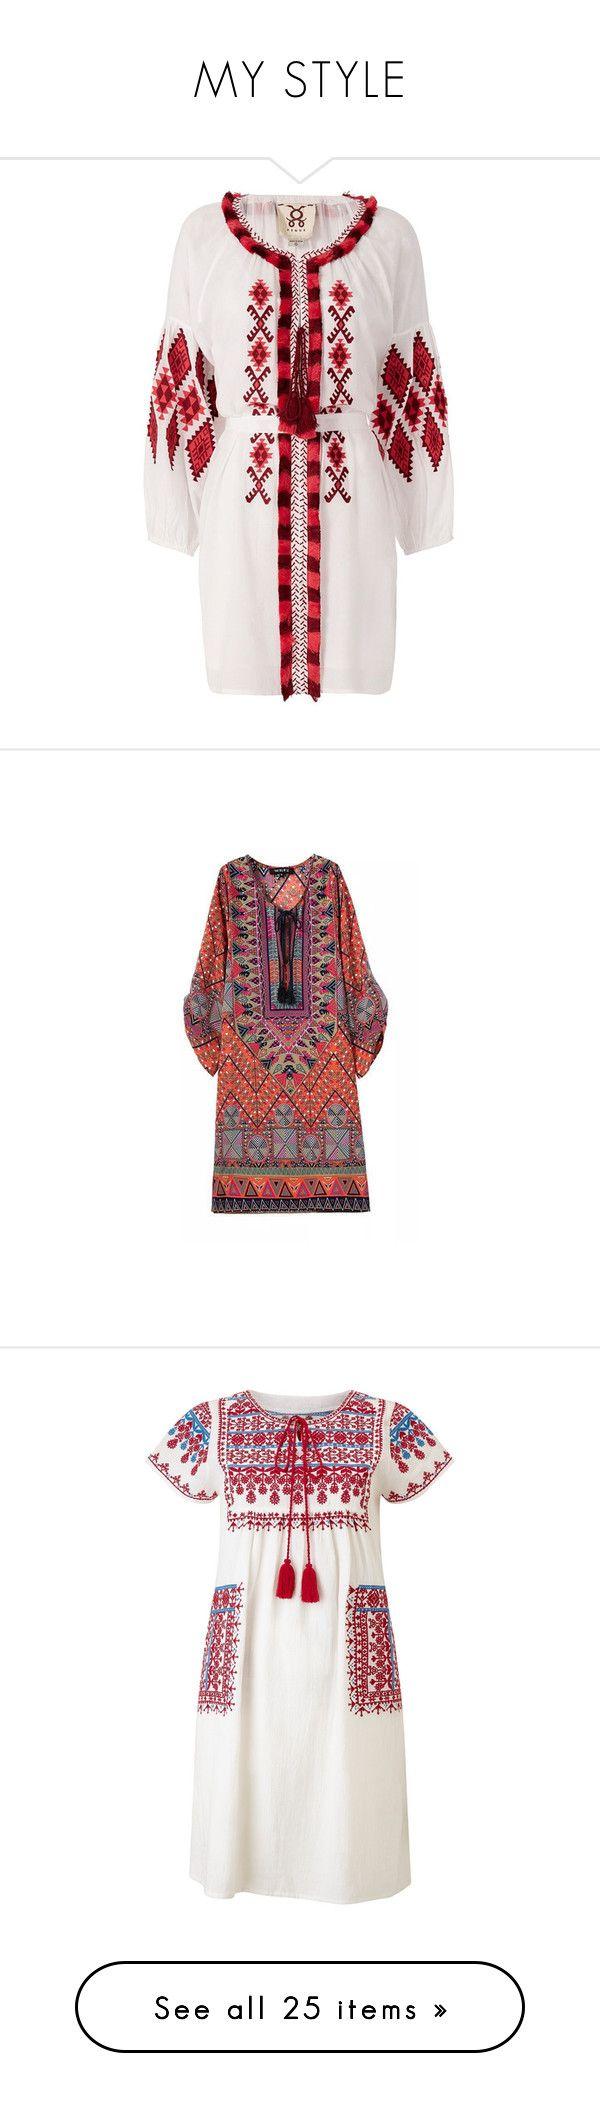 """MY STYLE"" by purplerose27 ❤ liked on Polyvore featuring dresses, tassel dress, boho style dresses, long sleeve boho dress, long sleeve bohemian dress, longsleeve dress, red, mini dress, chiffon dress and red print dress"